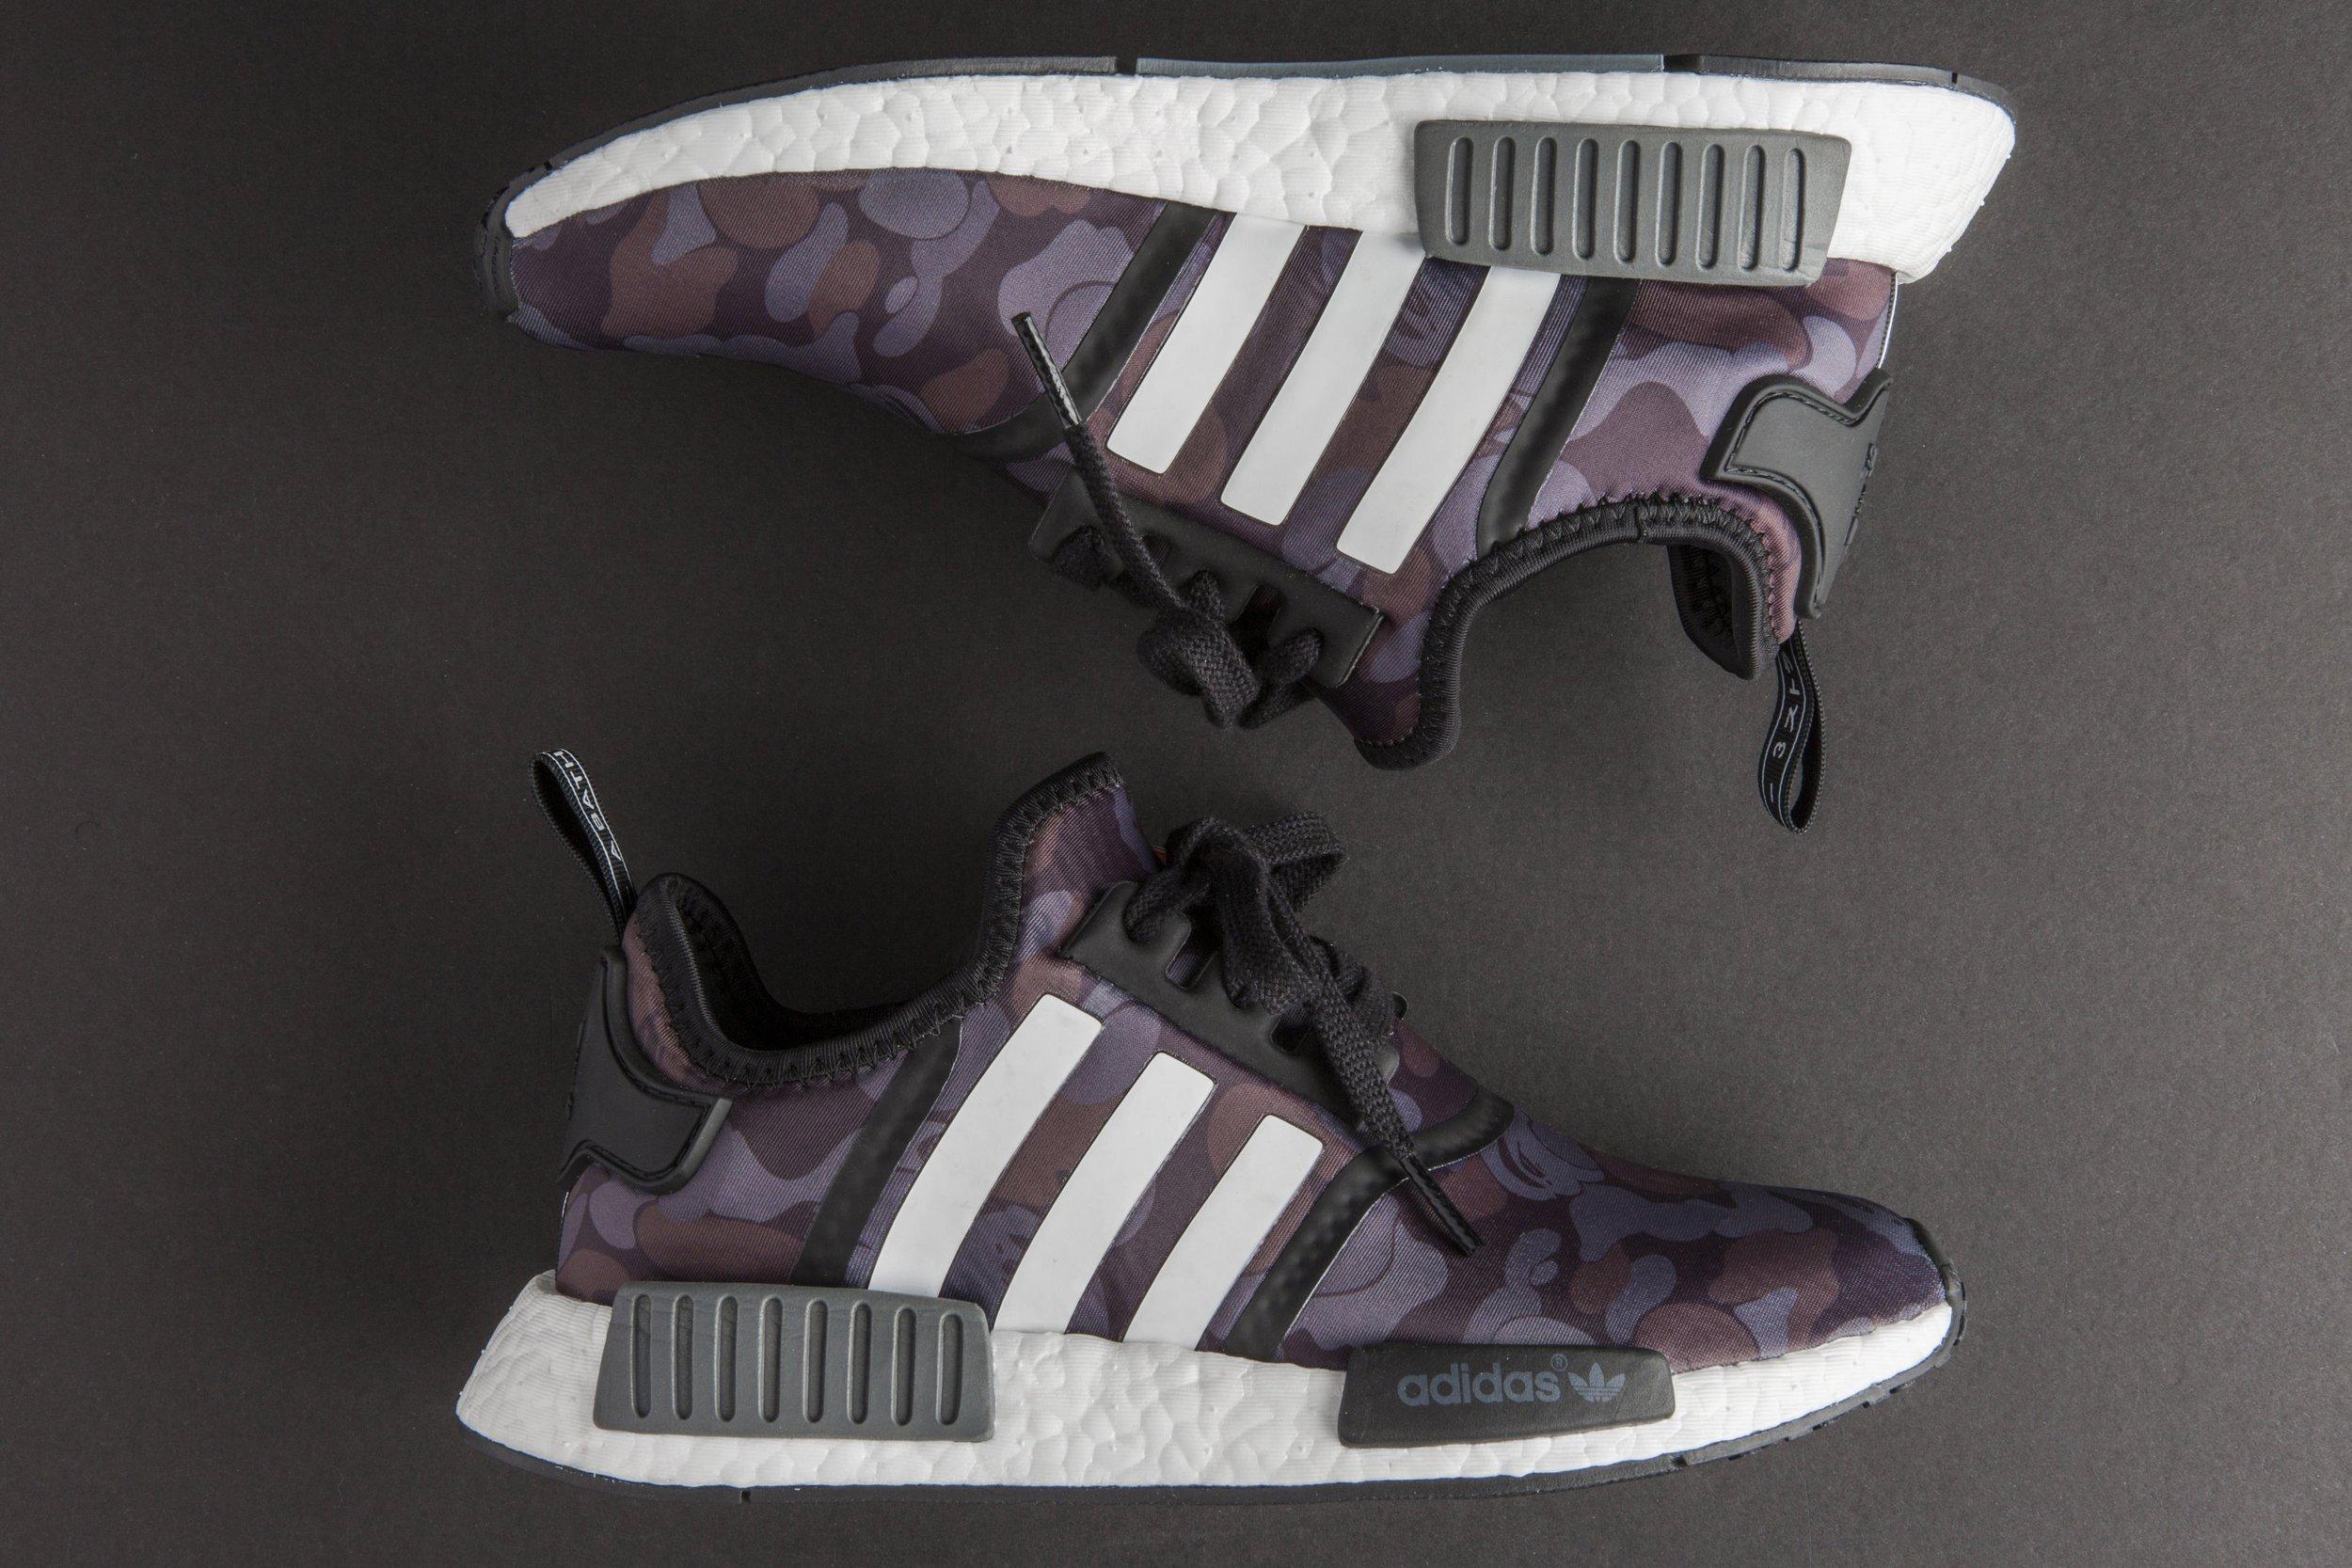 bape_purp_adidas_nmd_stripe_center_azillian_8.jpg